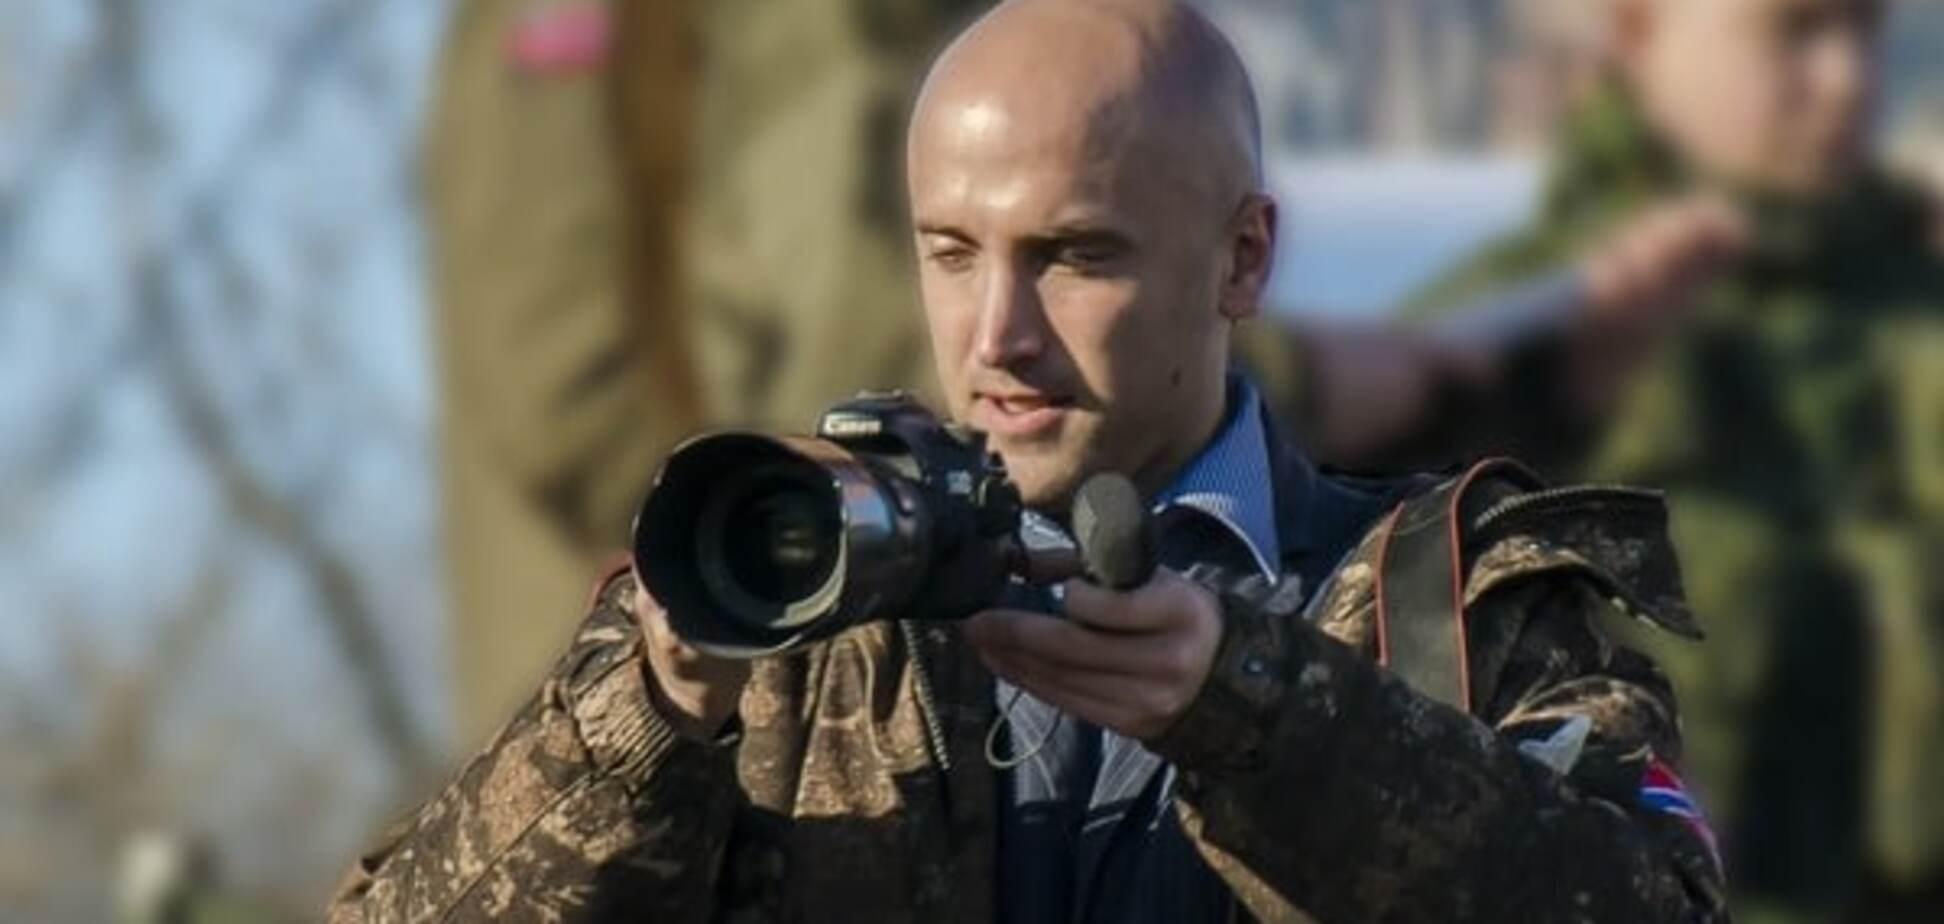 Лысенко рассказал, как пропагандист Филлипс позитивно влияет на бойцов АТО